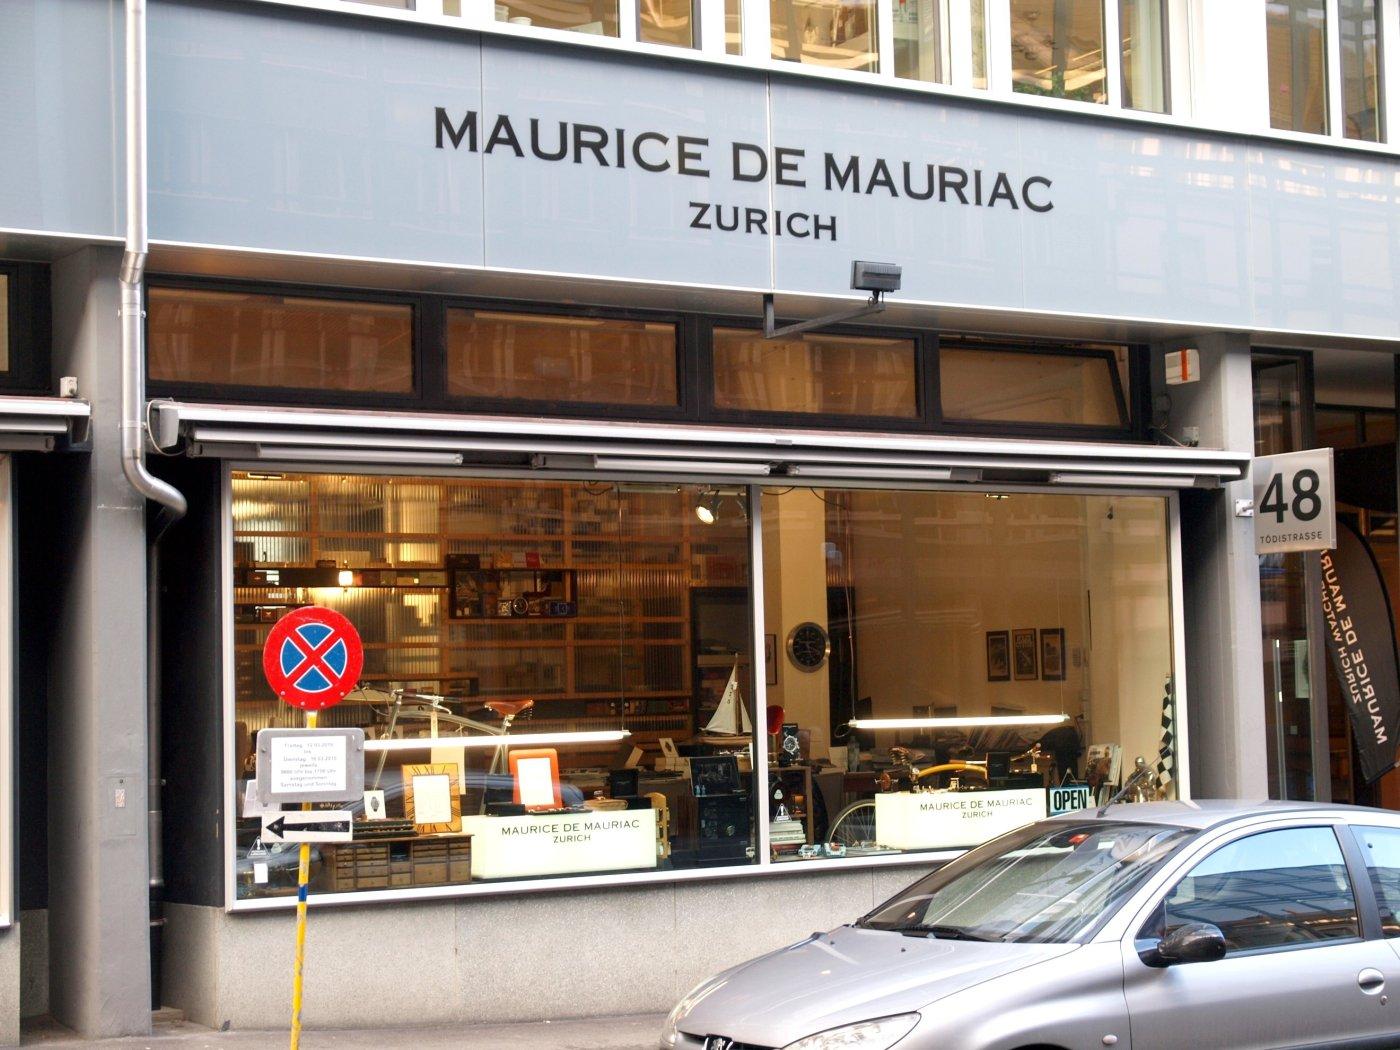 Maurice de Mauriac Zurich Atelier Tour